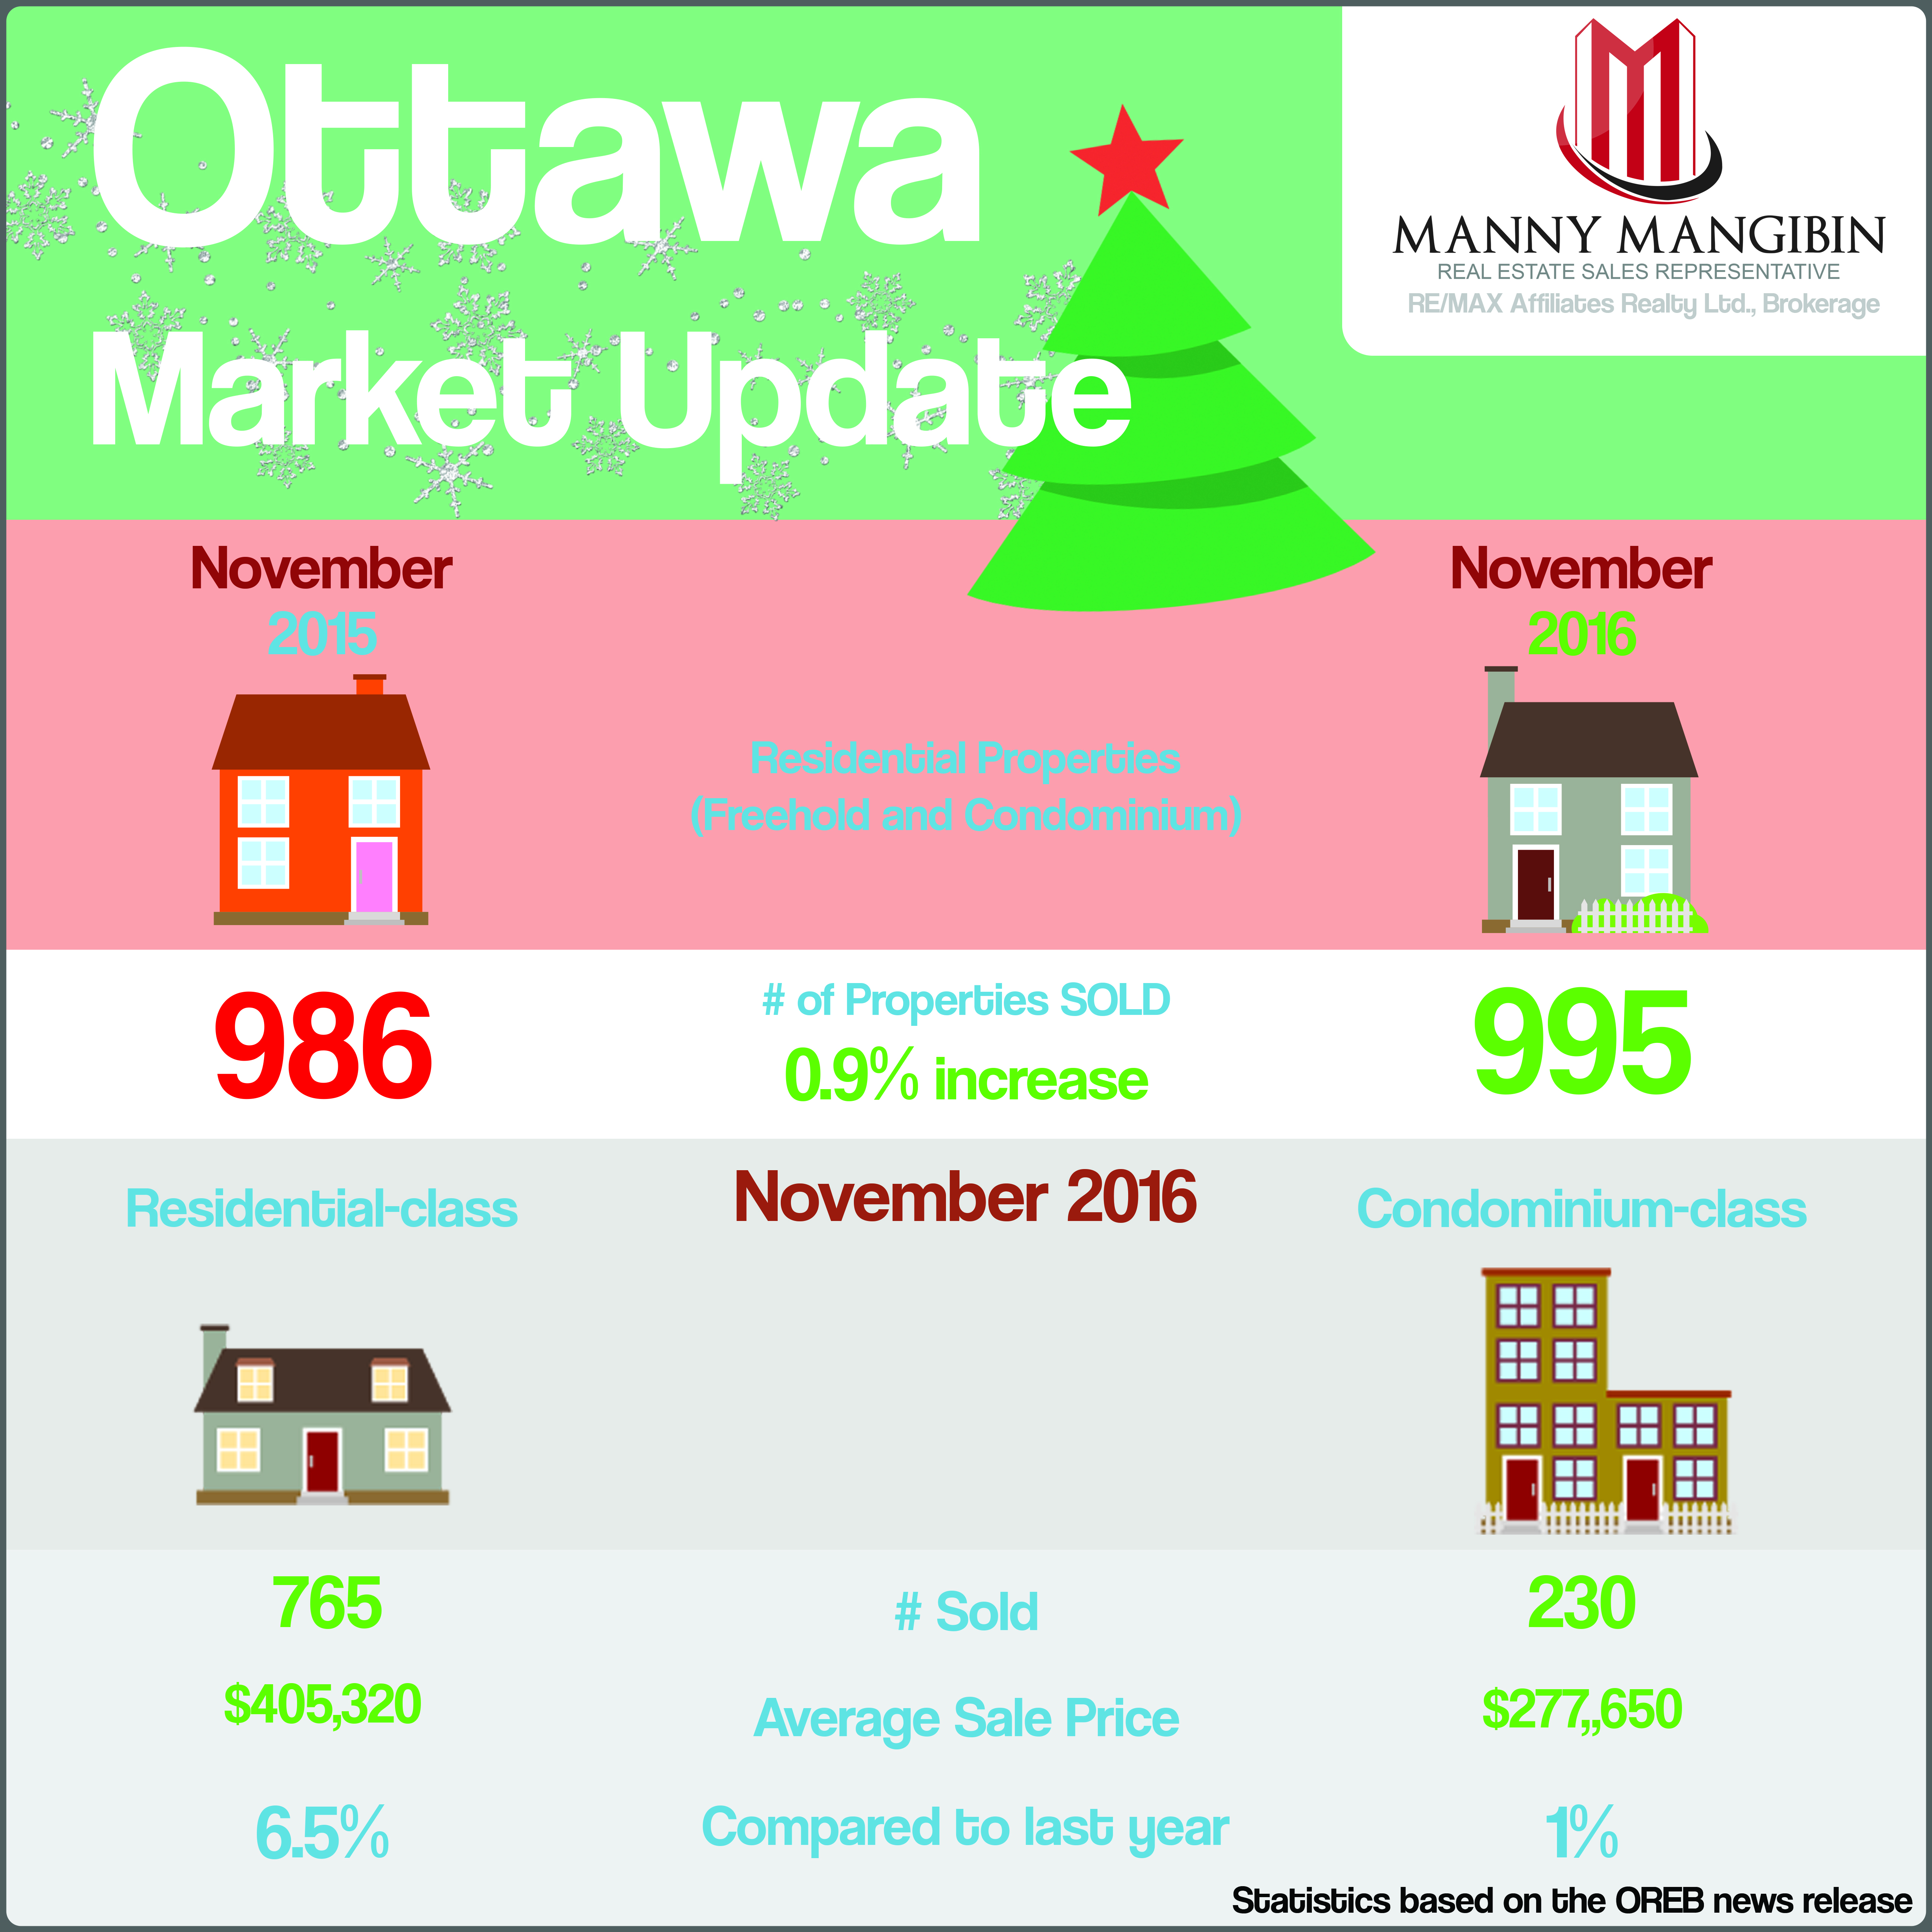 November 2016 stats